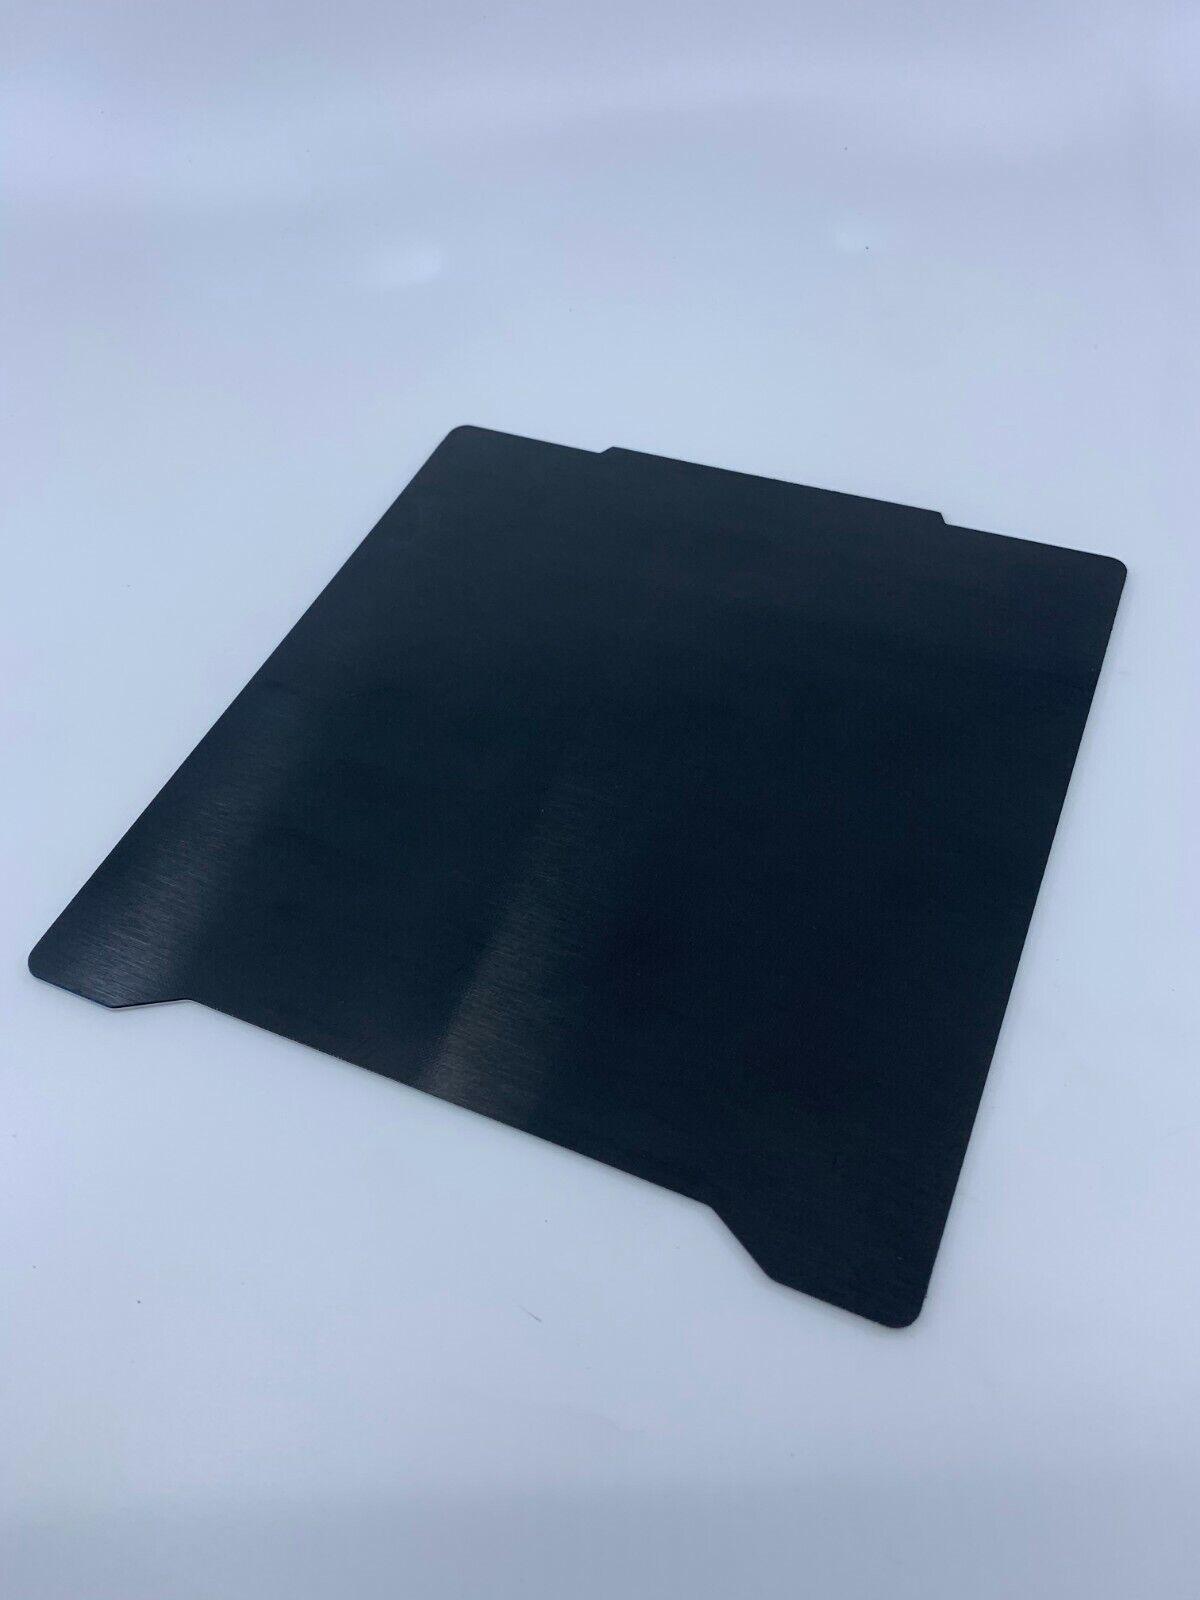 Prusa Mini Removable Build Plate w/ BuildTak Print Surface USA MADE